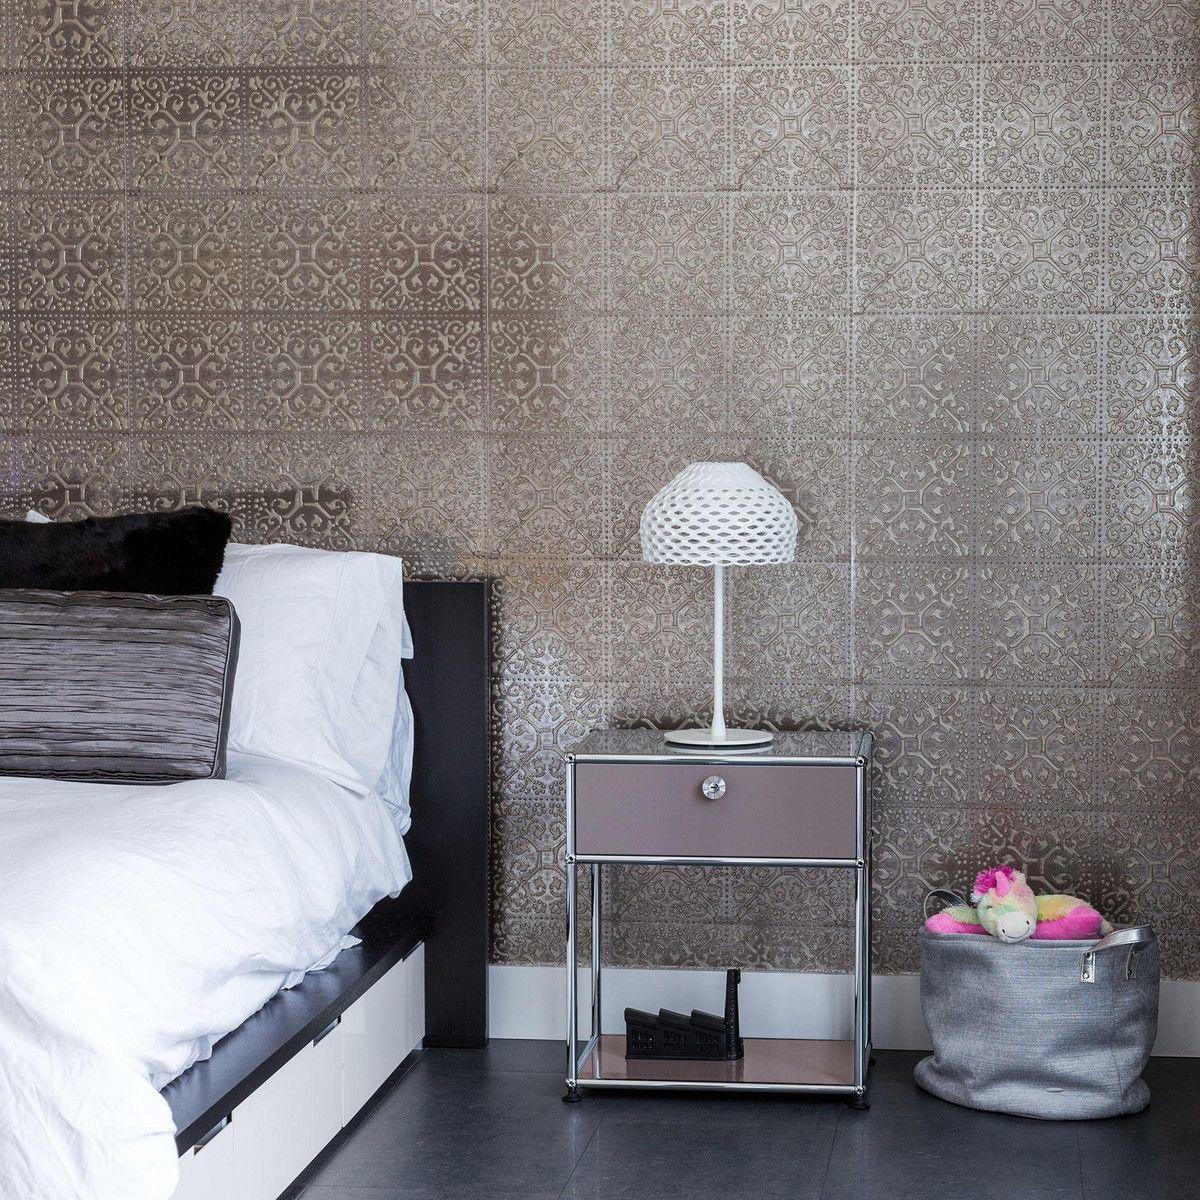 usm beistelltisch mit klappt r h 61cm usm haller. Black Bedroom Furniture Sets. Home Design Ideas